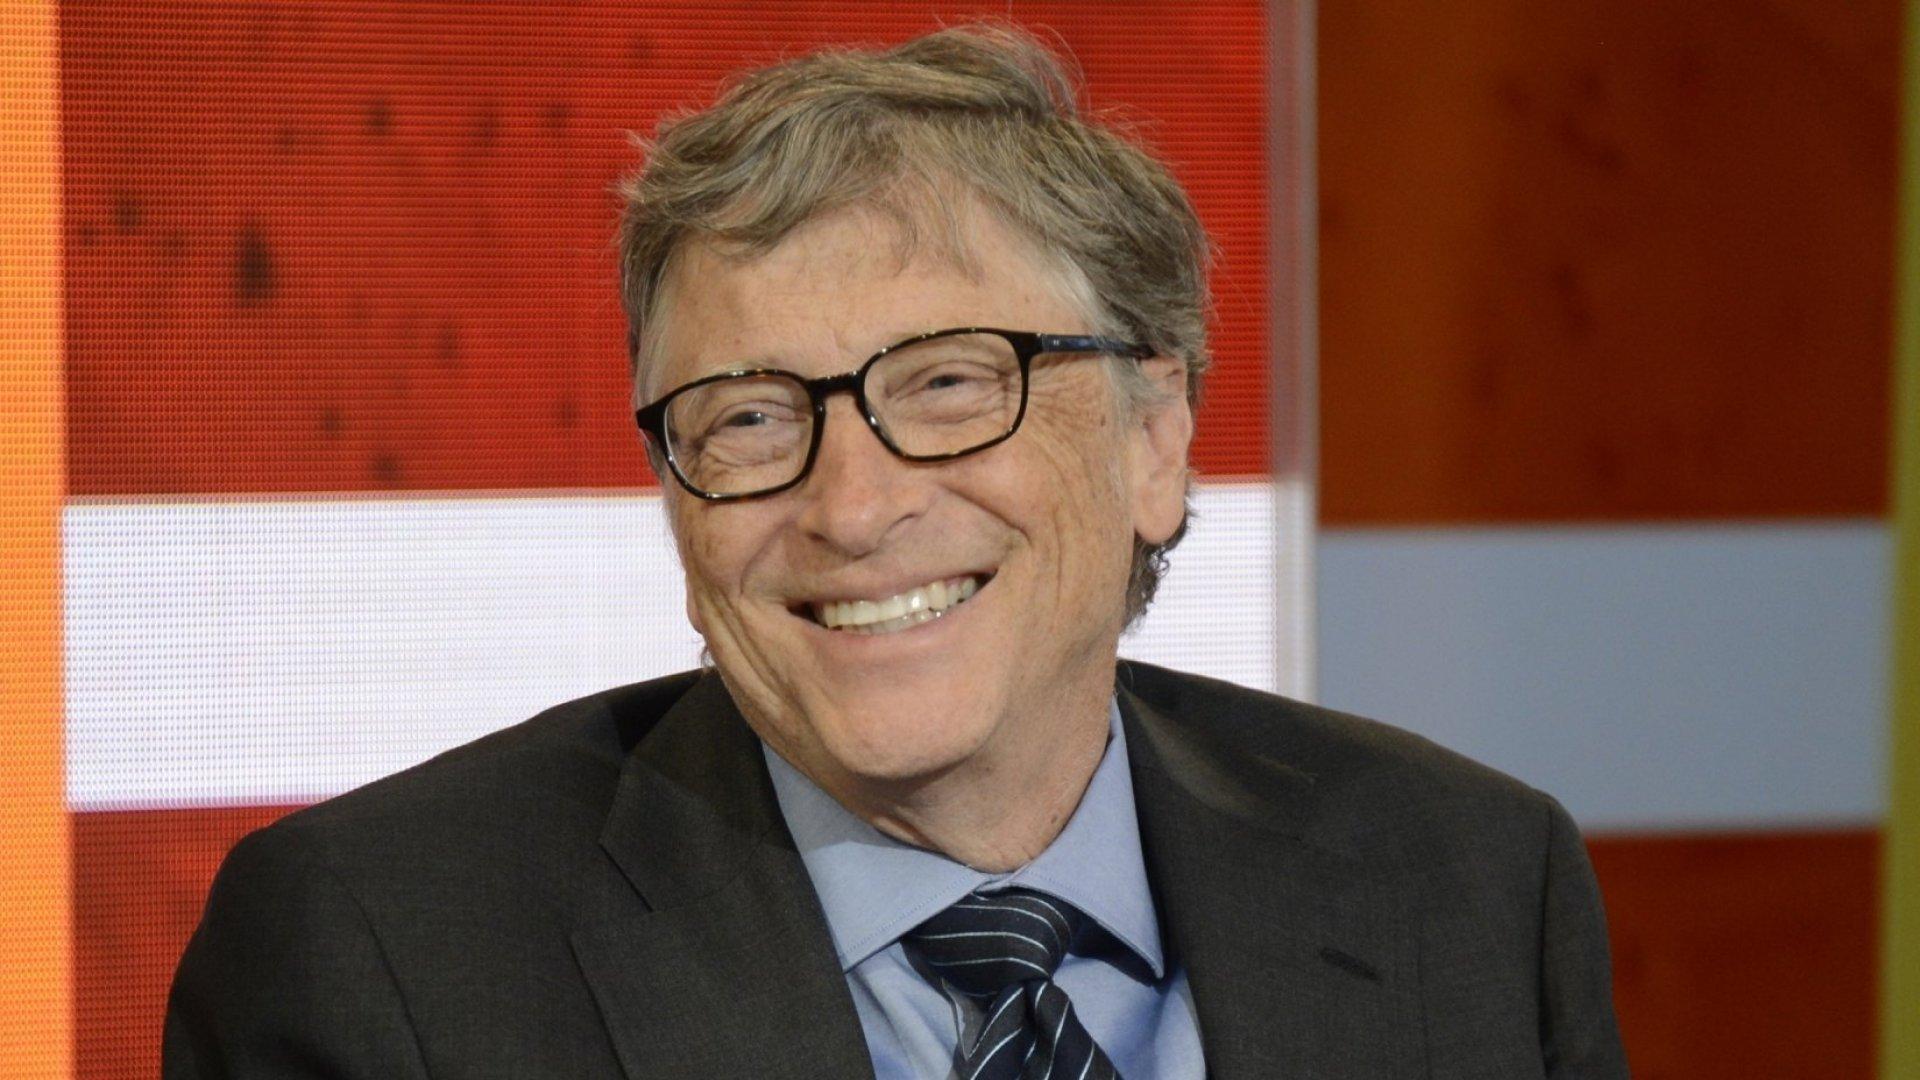 4 Habits That Finally Helped Bill Gates Get a Better Night's Sleep